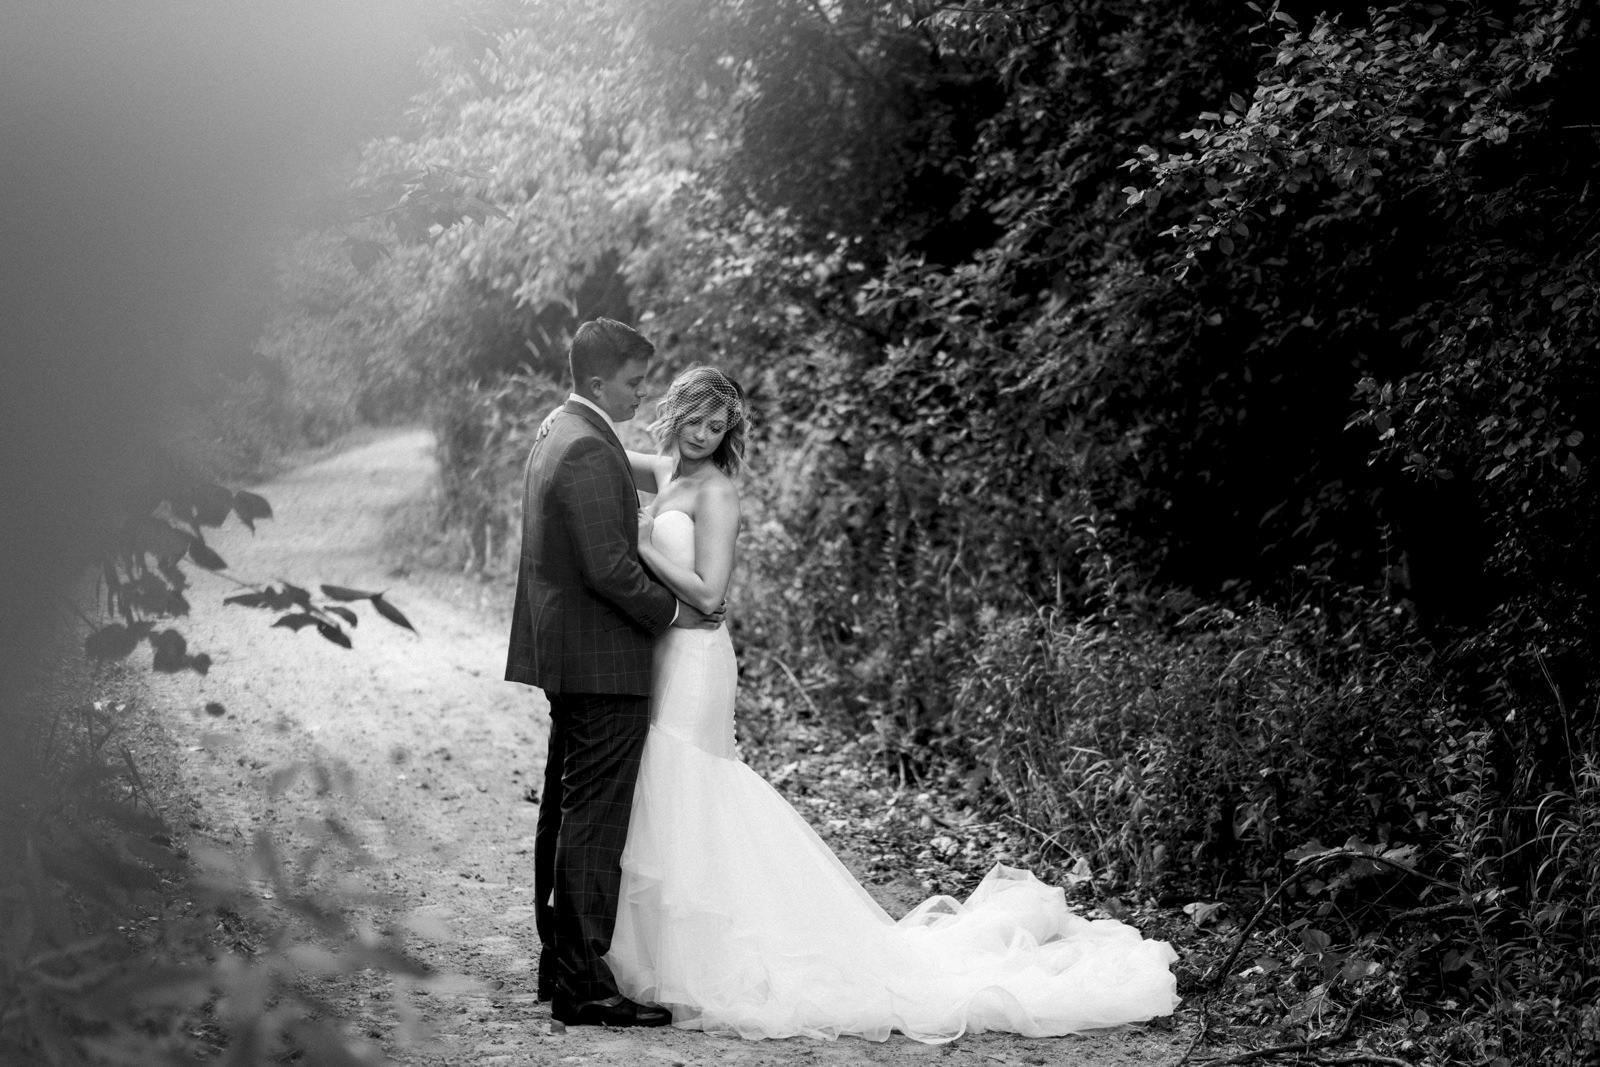 Wedding photography in Northwest Ohio.